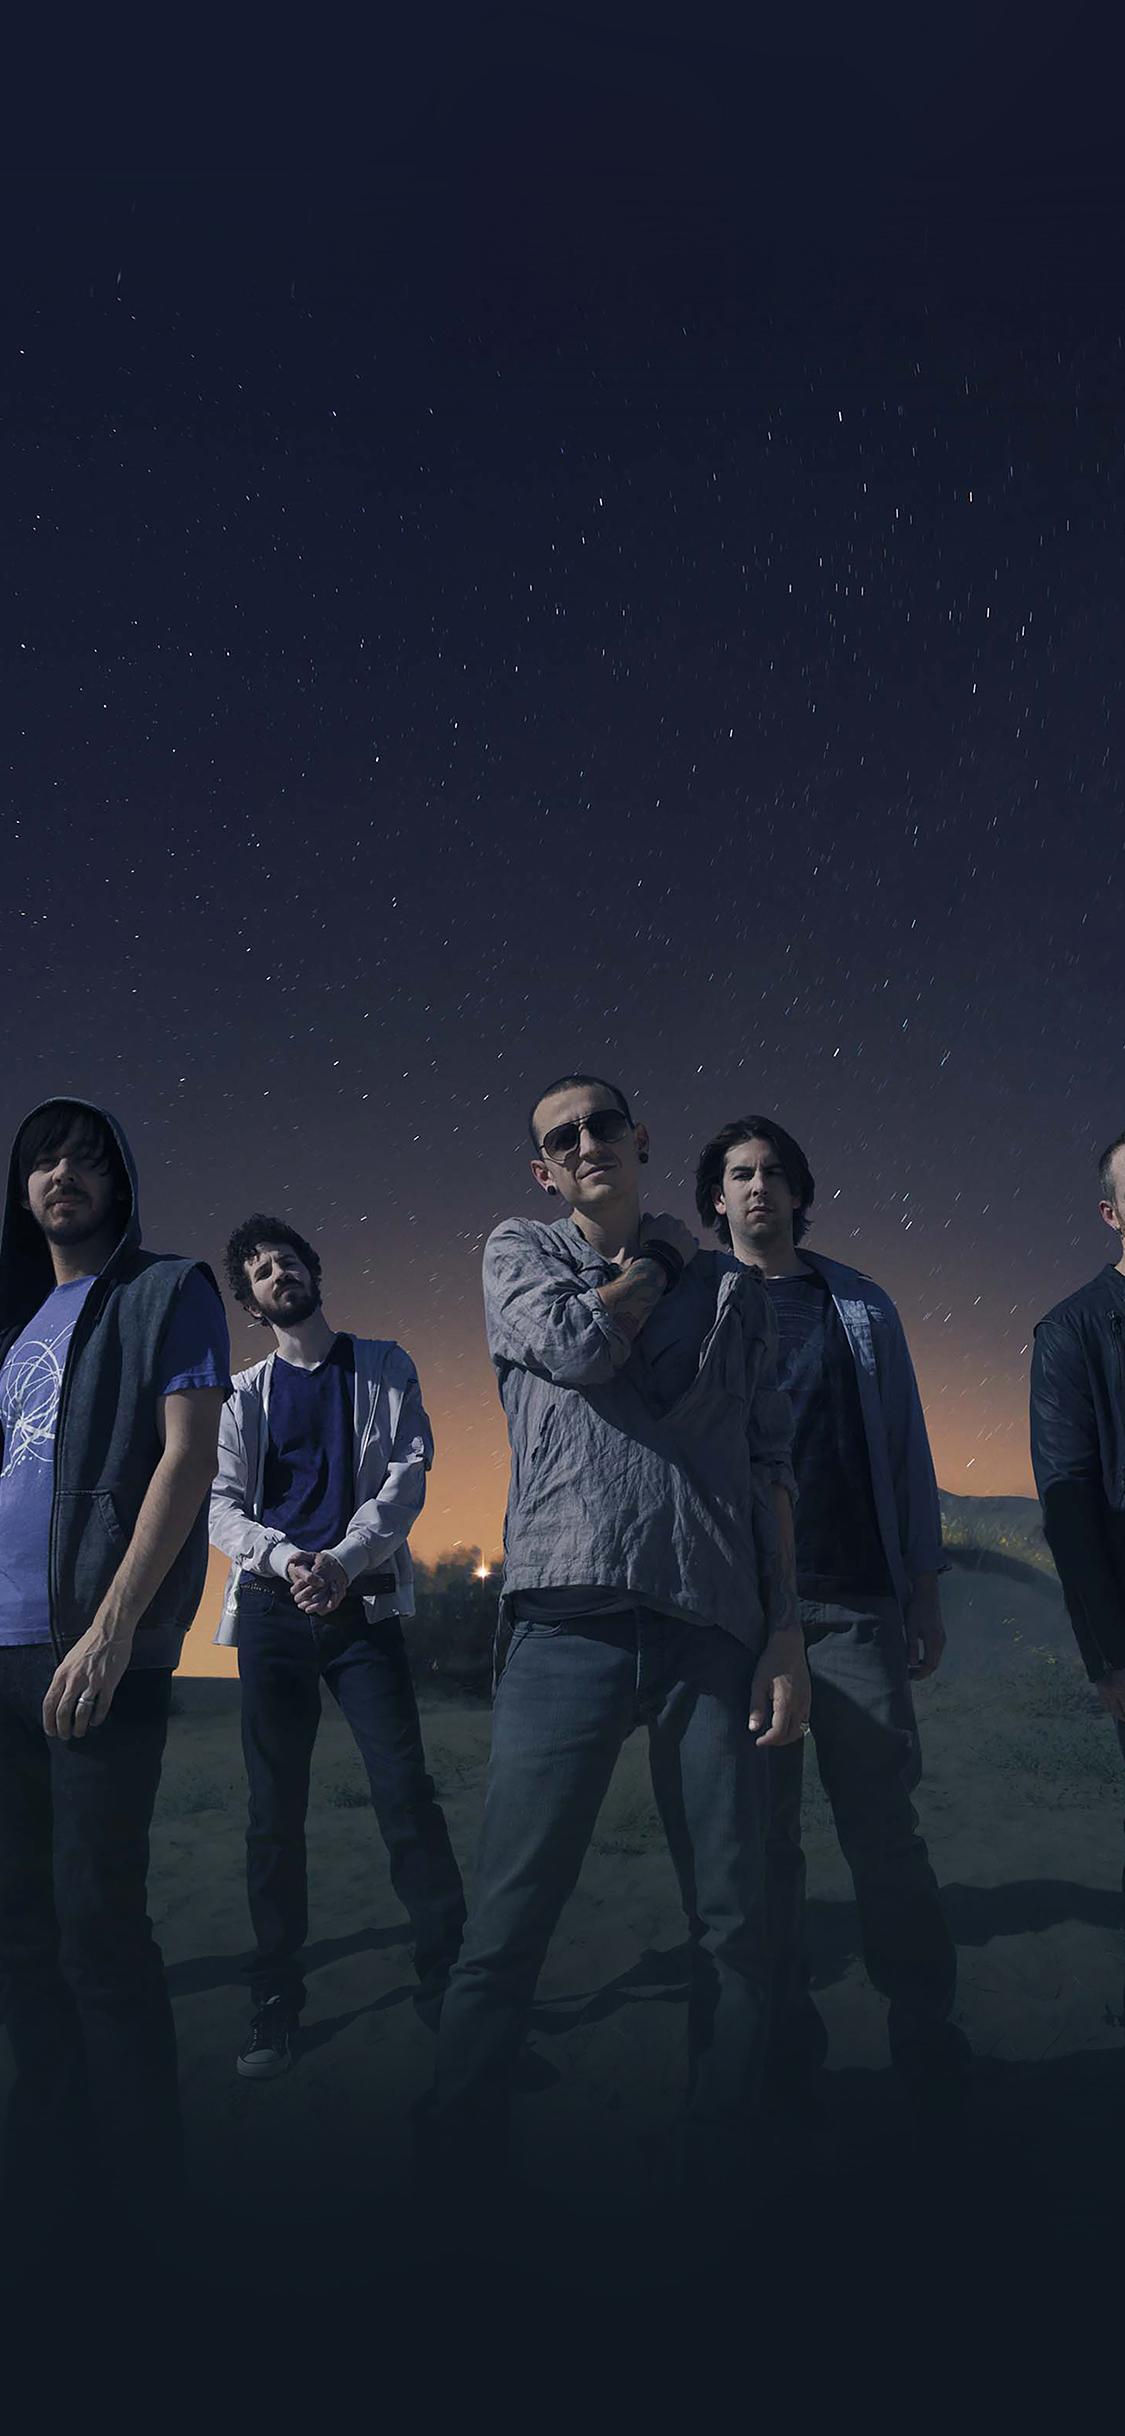 Hc88 Linkin Park Space Music Stars Celebrity